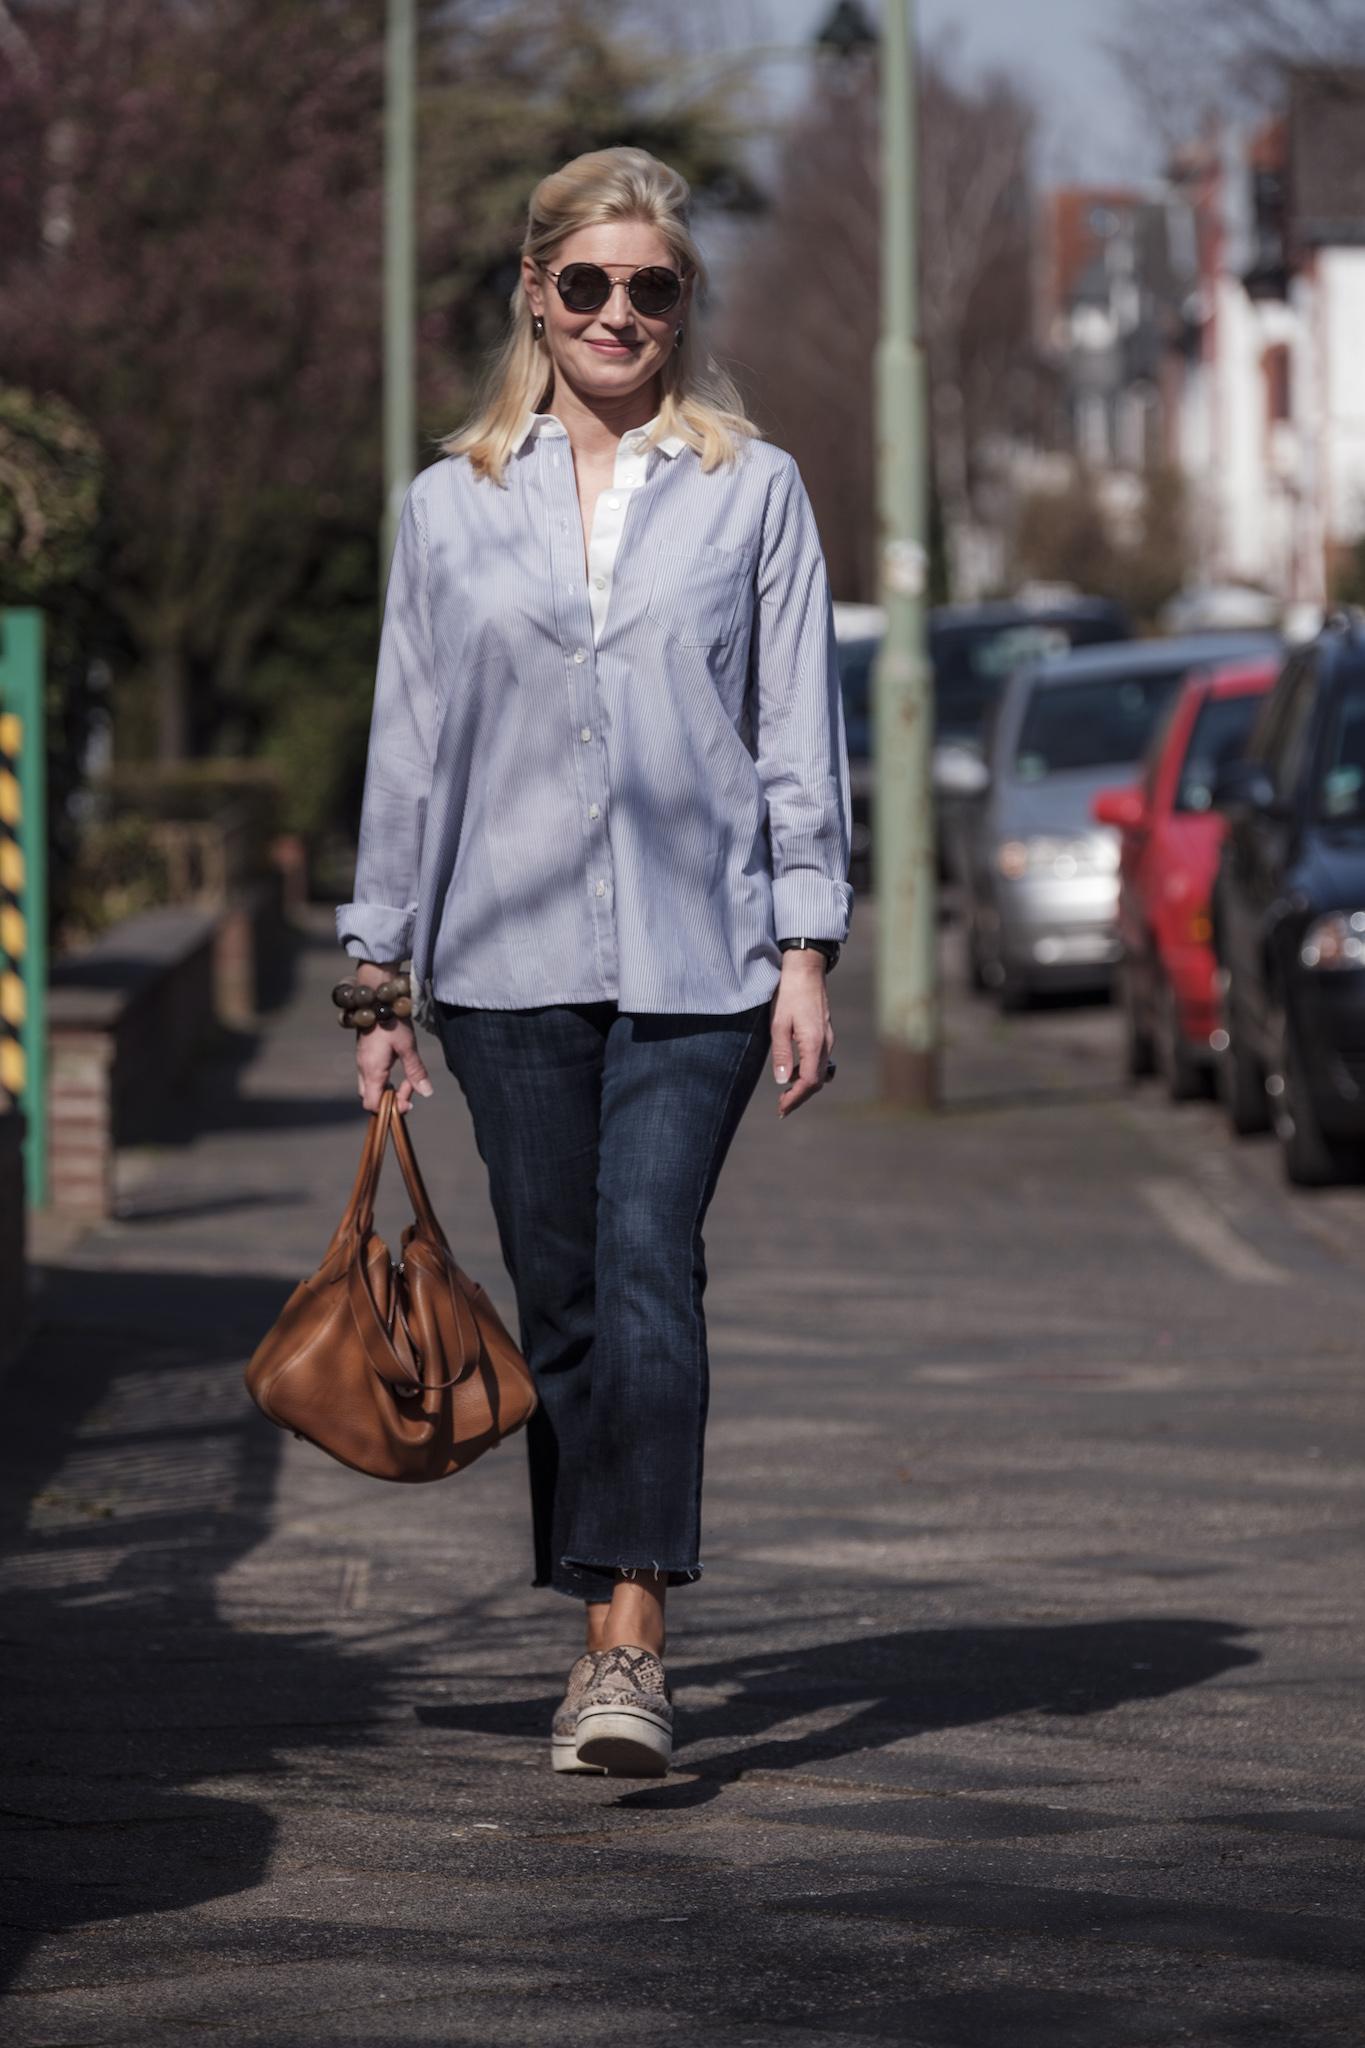 Sem Per Lei fashion , SemPerLei Mode, Fashion-Blog Lieblingsstil, gestreifte Bluse blau weiß mit Spitze, Fashion-Blog, Lieblingsstil.com,3